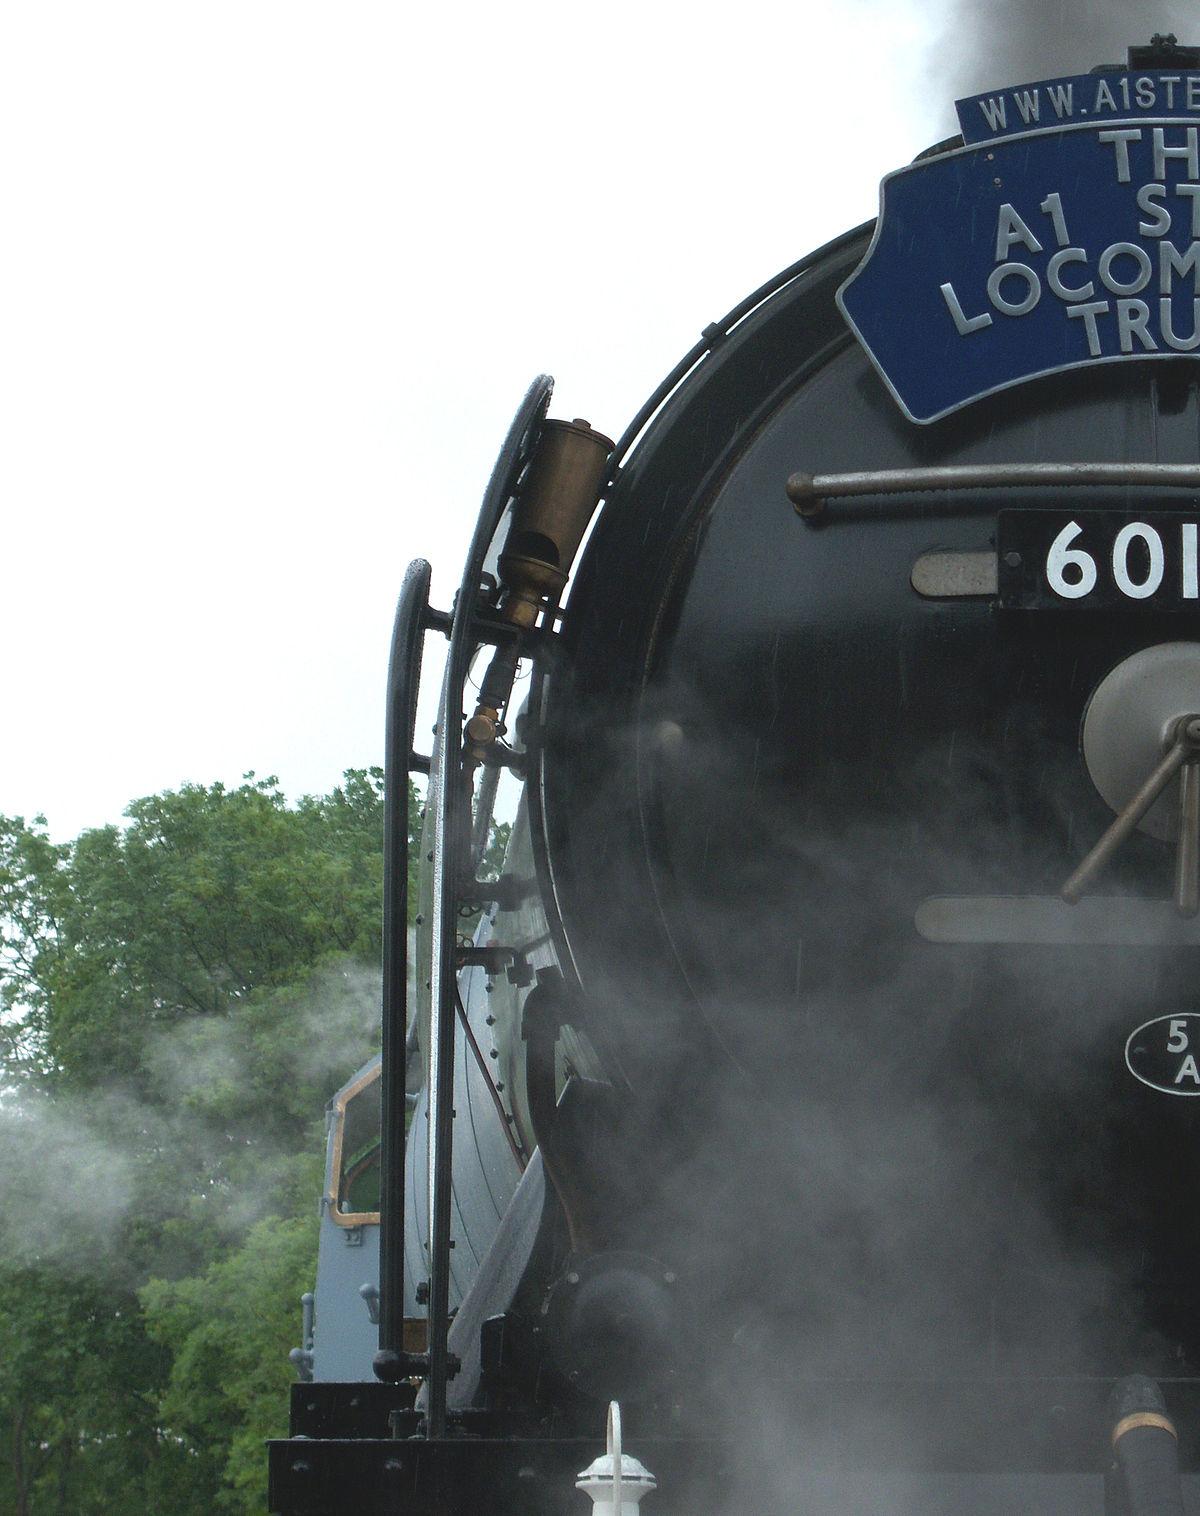 Train whistle - Wikipedia